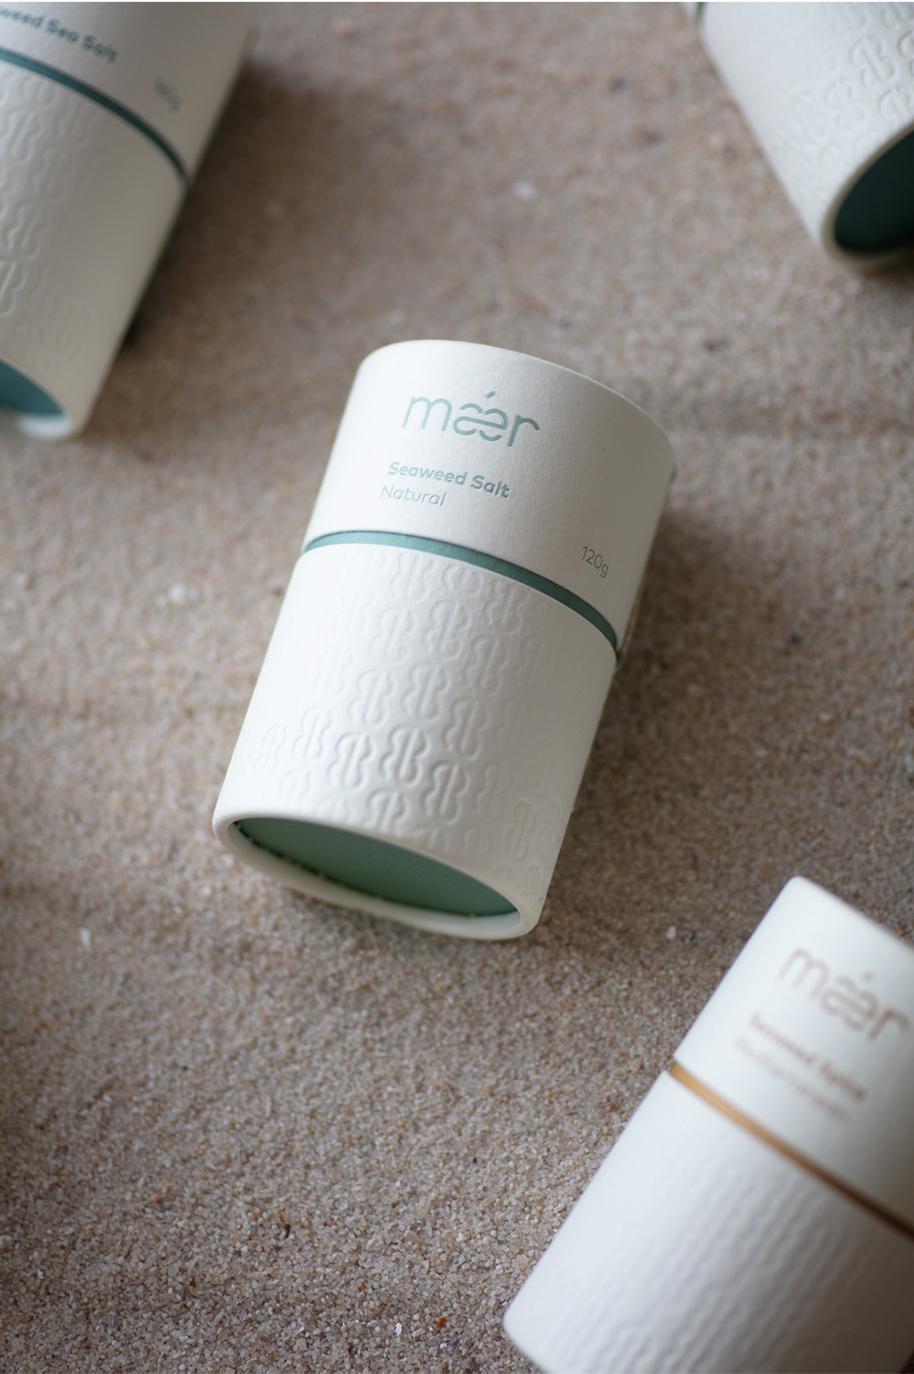 maer-packaging-1-hq